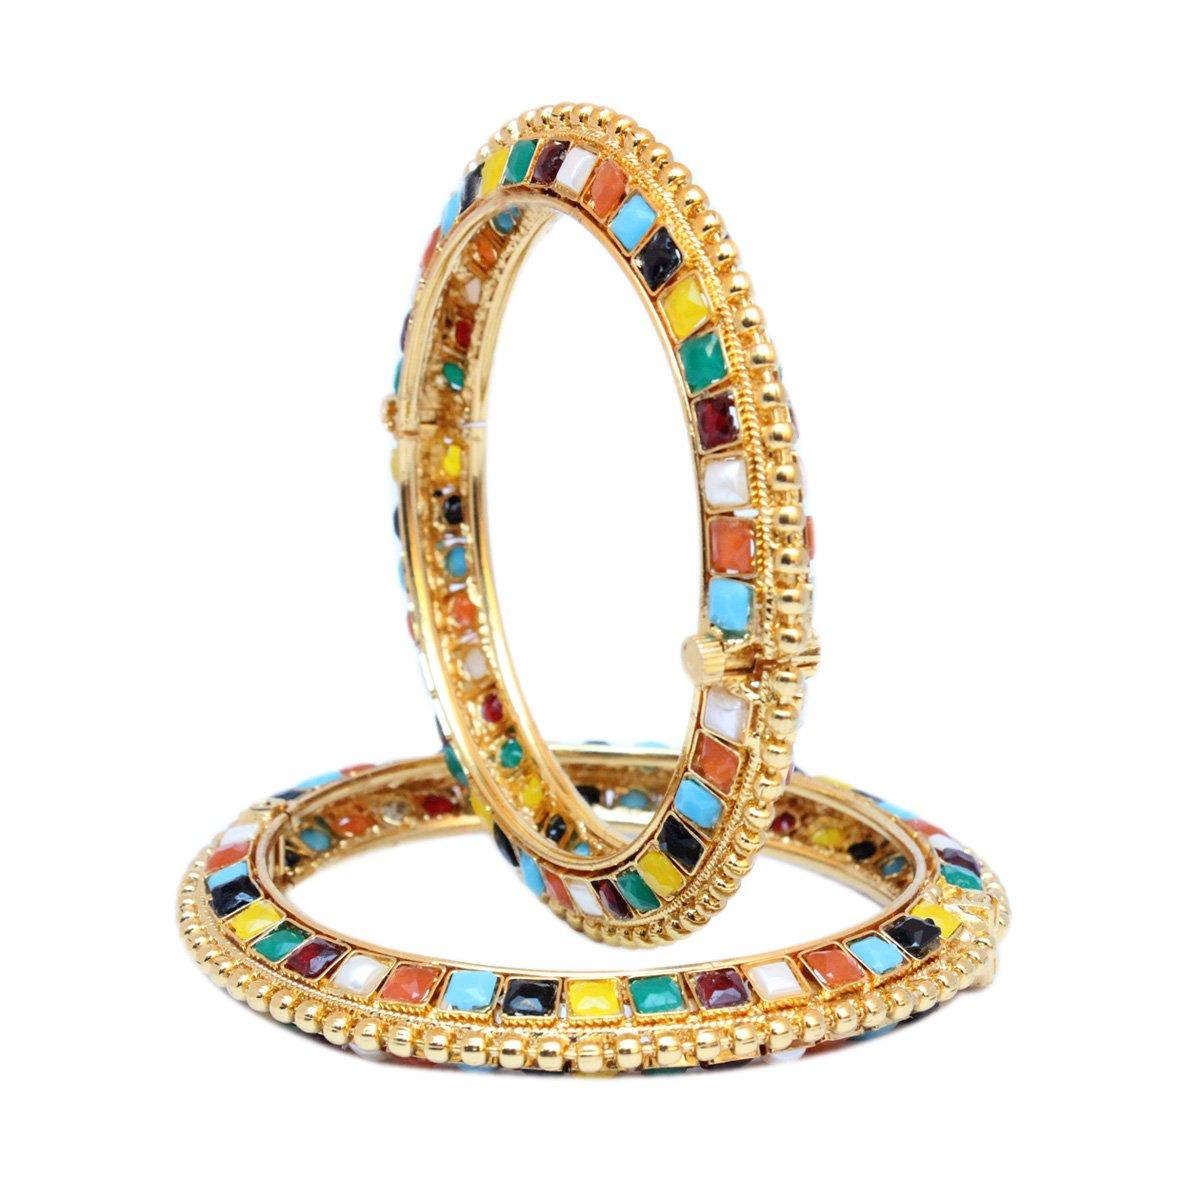 Sanara Bollywood Style Navratan GoldPlated Openable Bracelets Kada Set 2 Pcs Indian Fashion Jewelry (2.4)